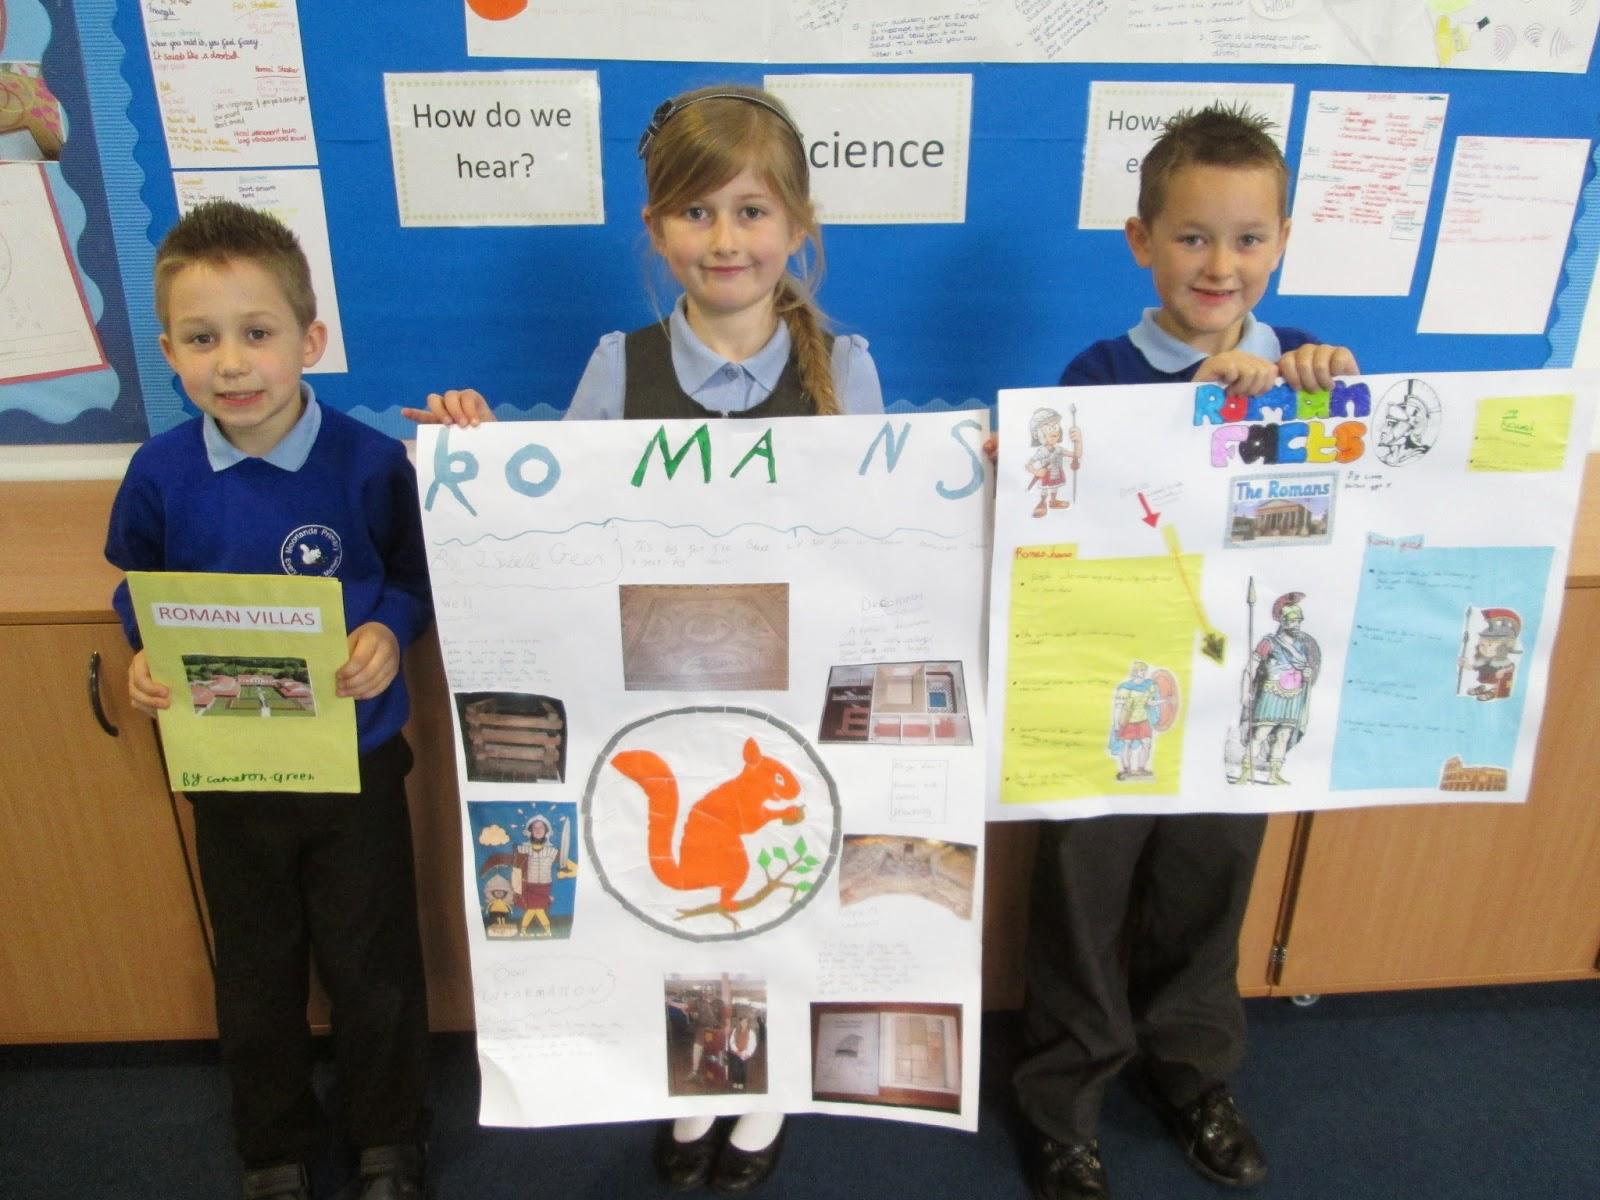 Roman entertainment primary homework help